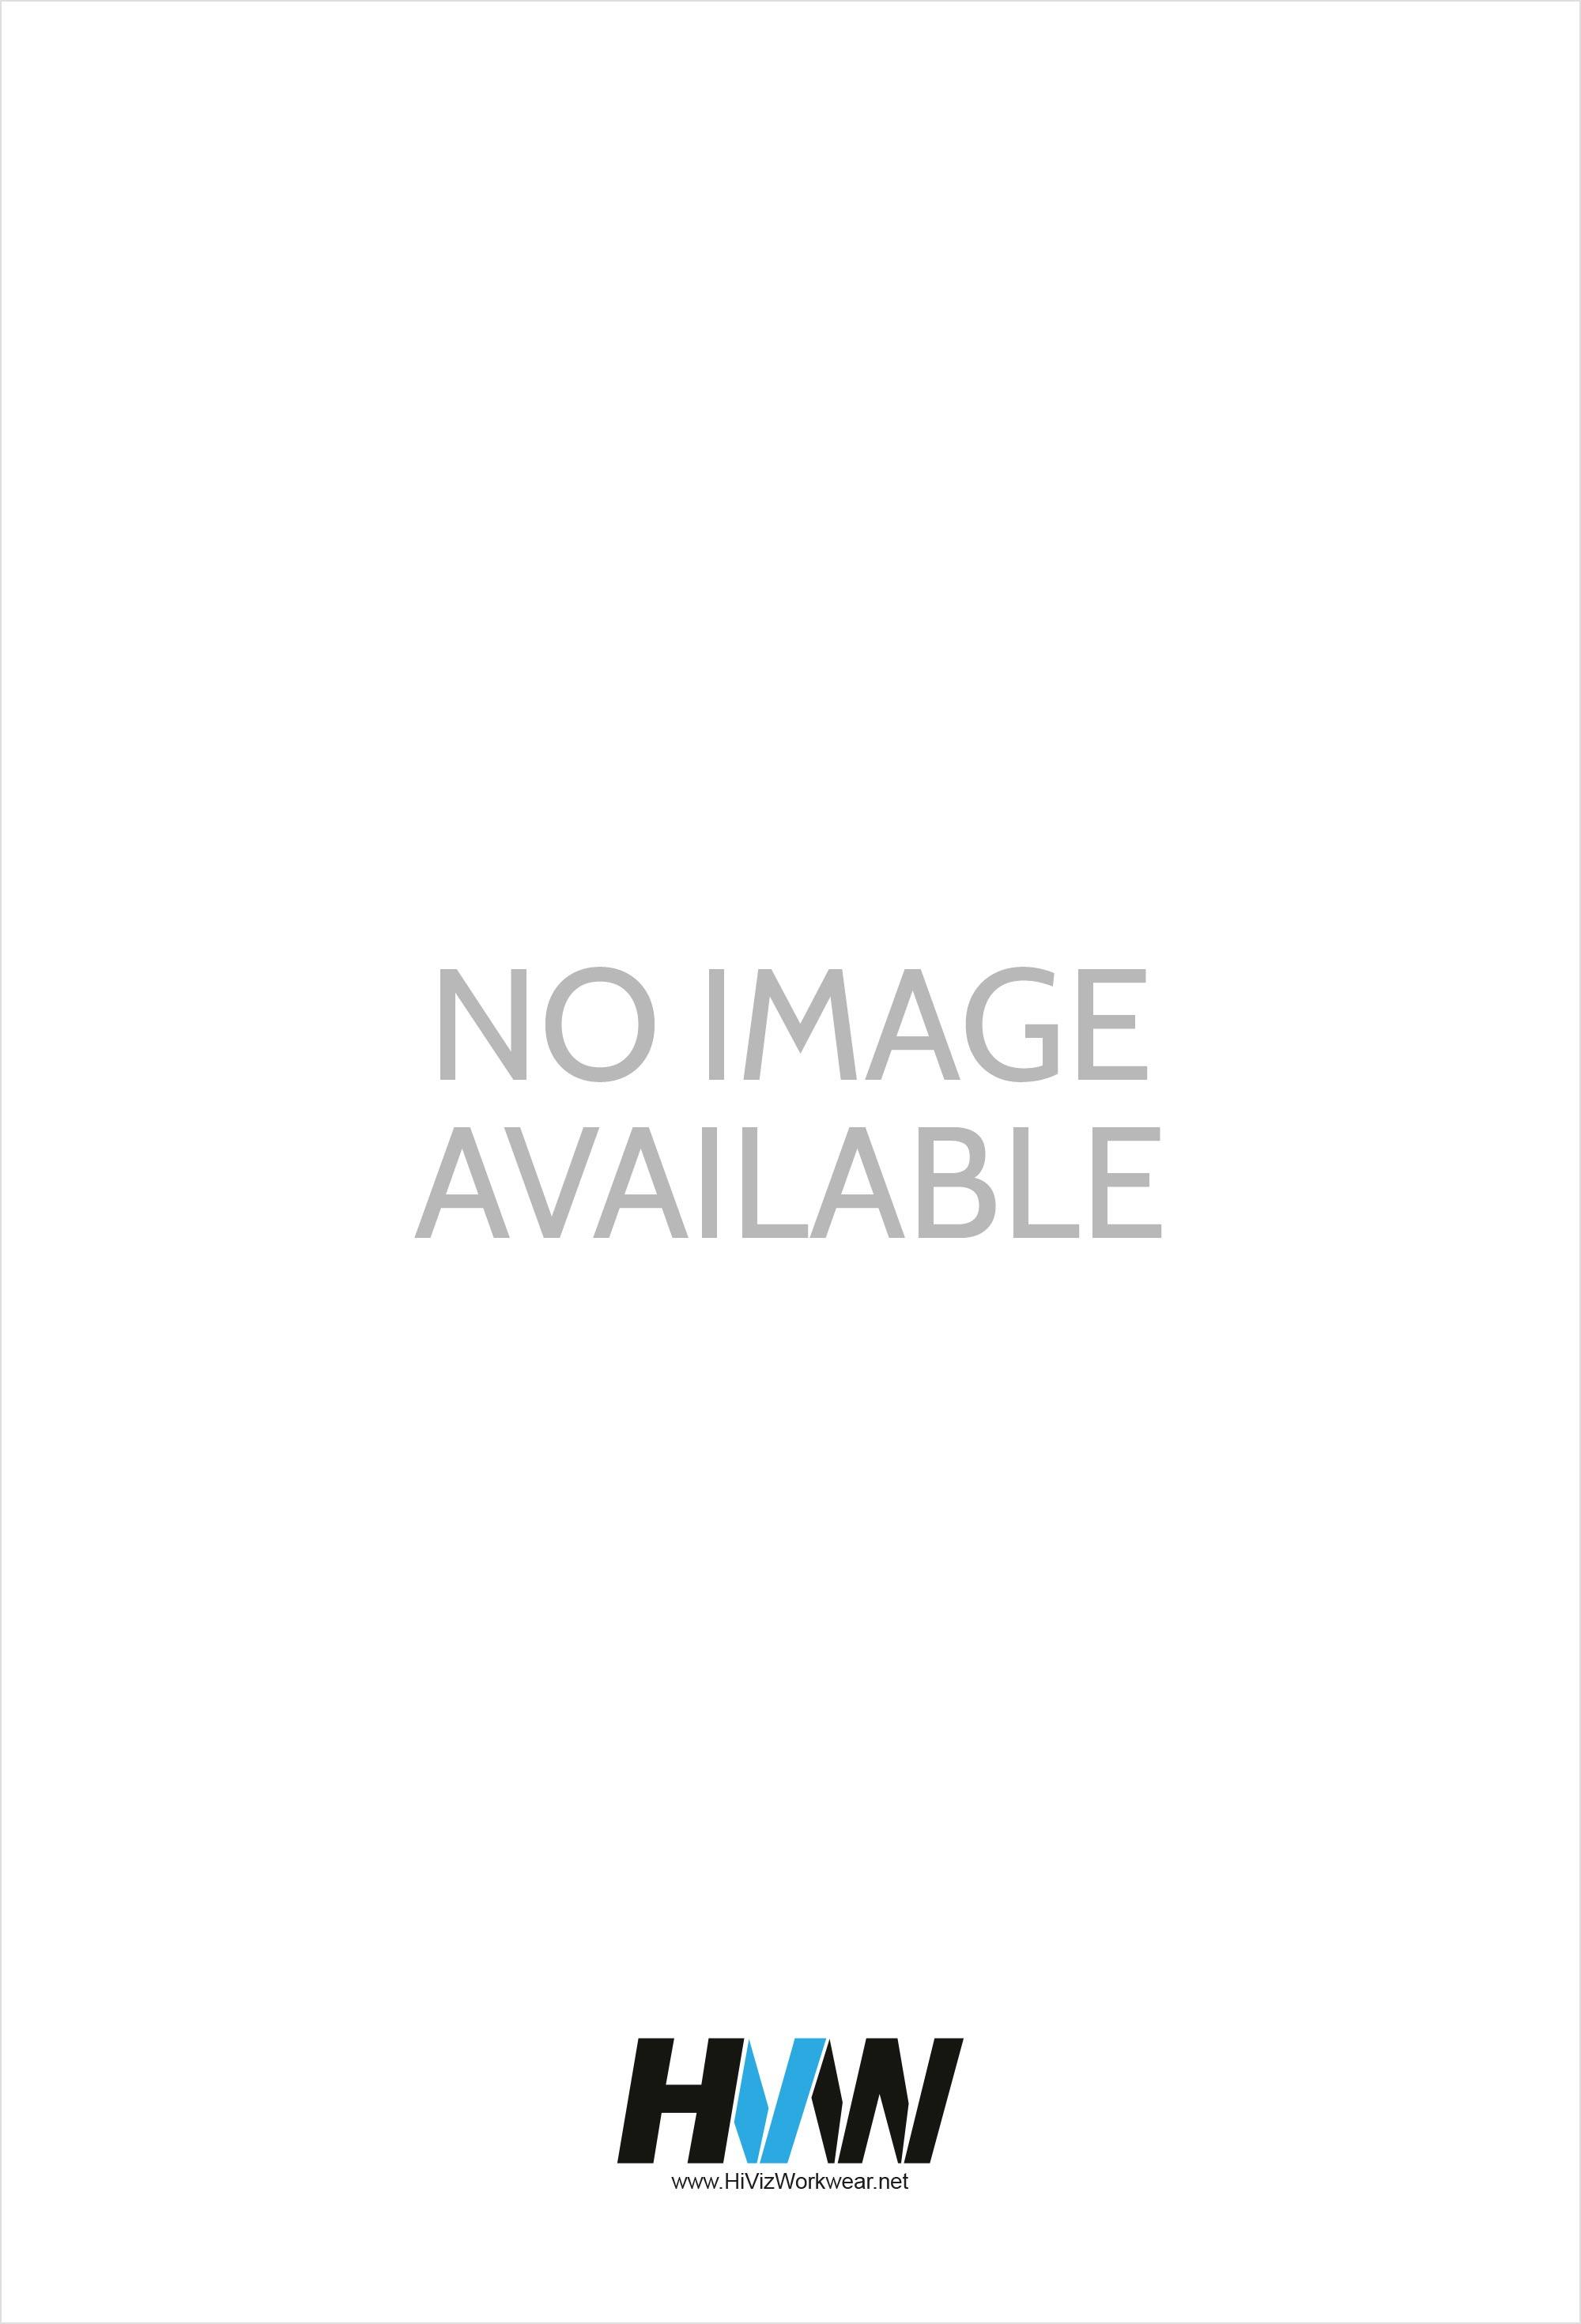 SS312 Premium 70/30 Ladies Full Zip Hooded Sweatshirt (Xsmall to 2Xlarge)